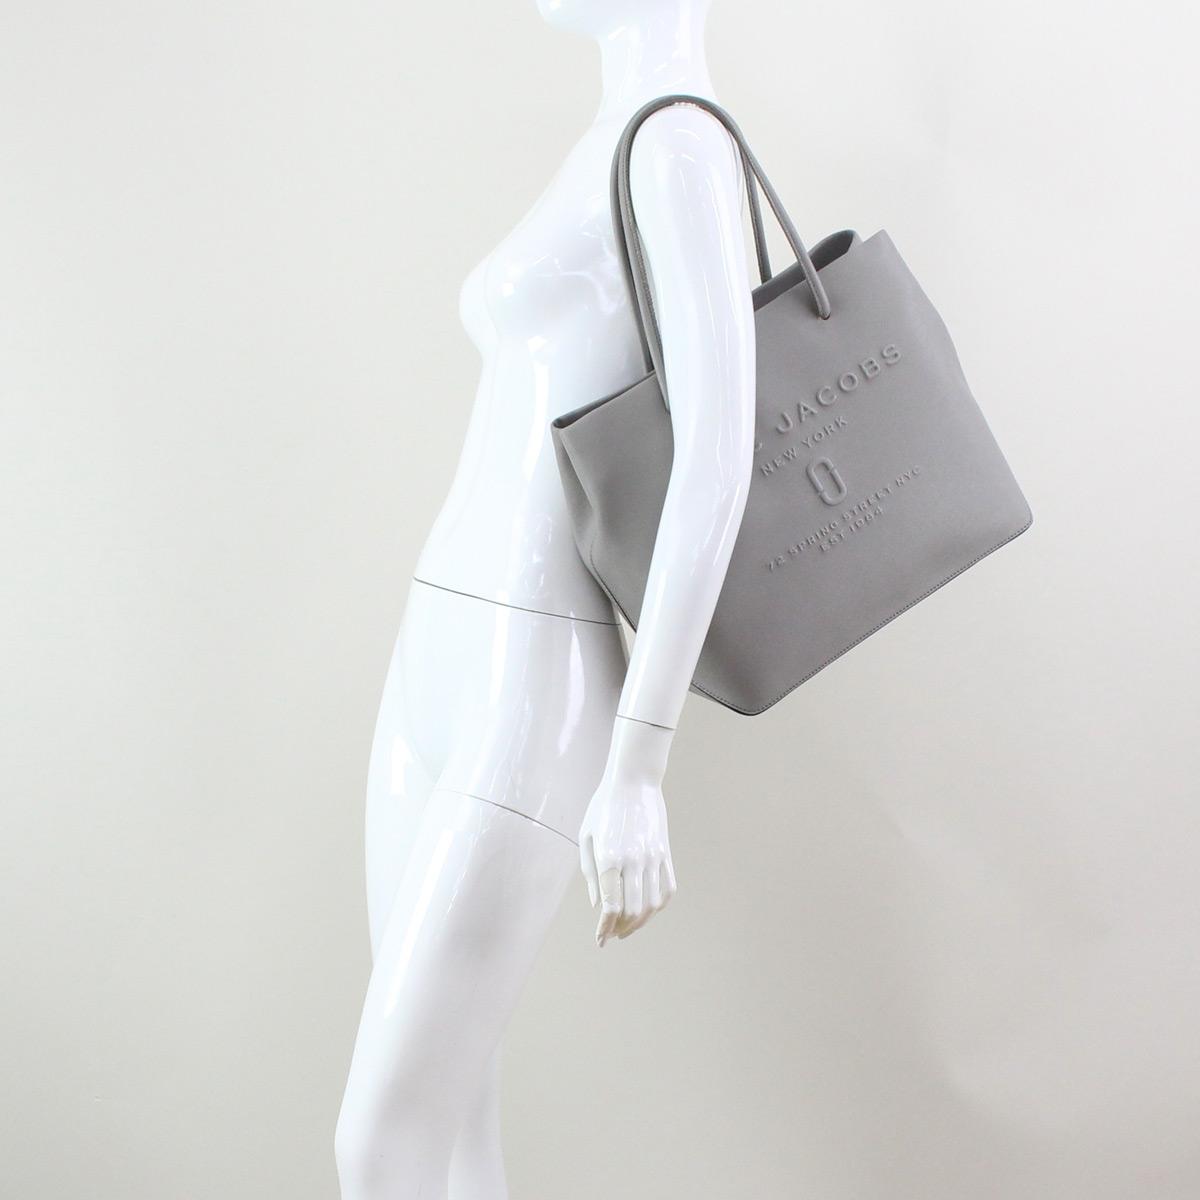 2bcea6d00225 Bighit The total brand wholesale  Mark Jacobs MARC JACOBS bag LOGO ...